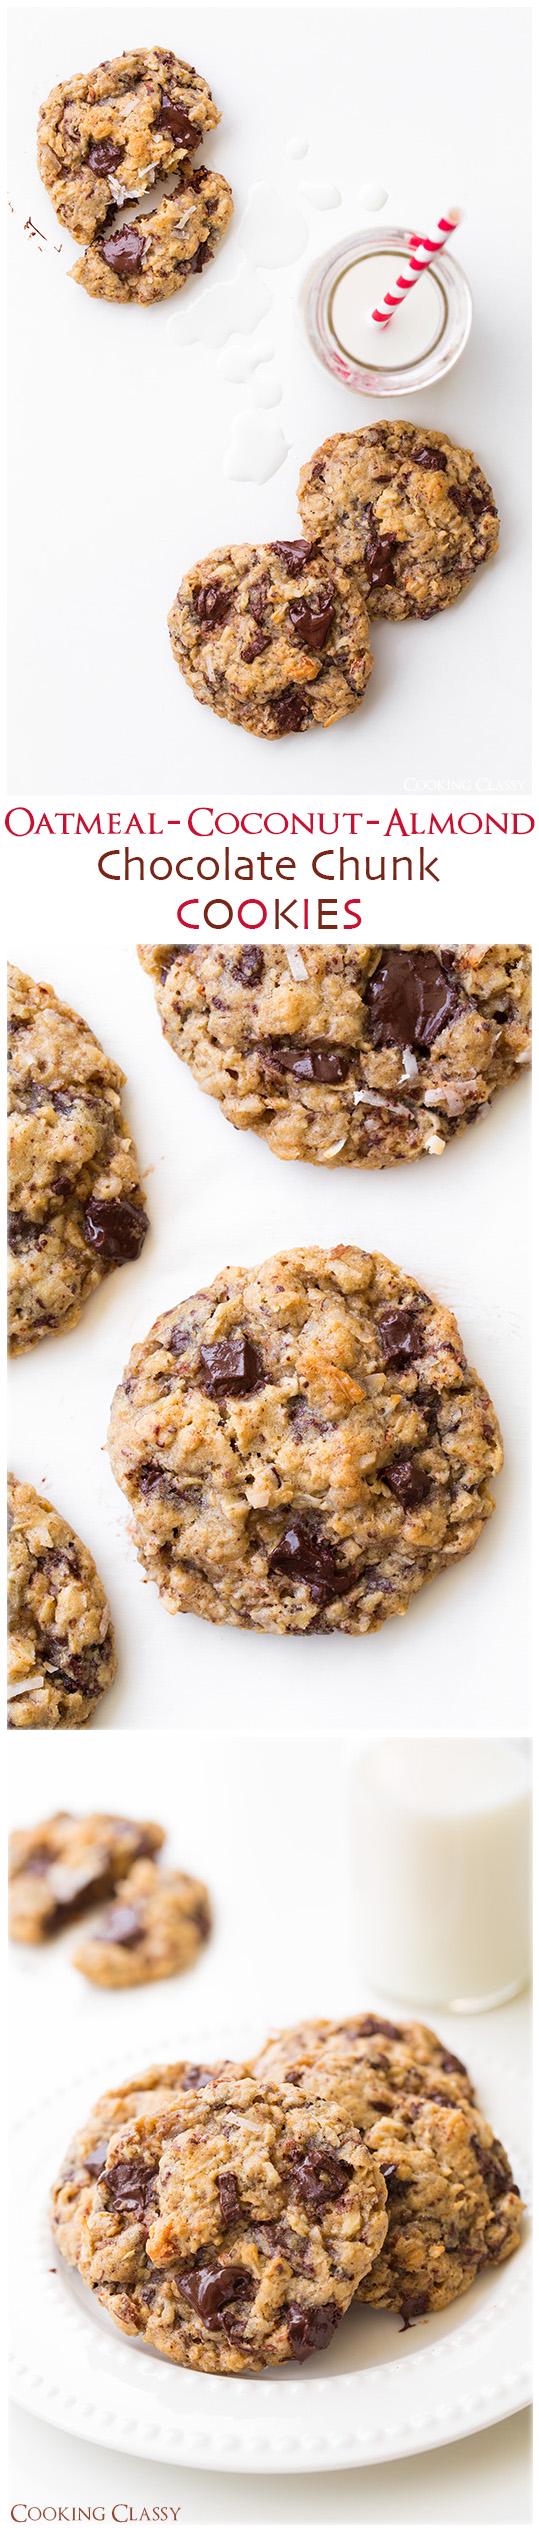 Oatmeal Coconut Almond Chocolate Chunk Cookies | Recipe ...